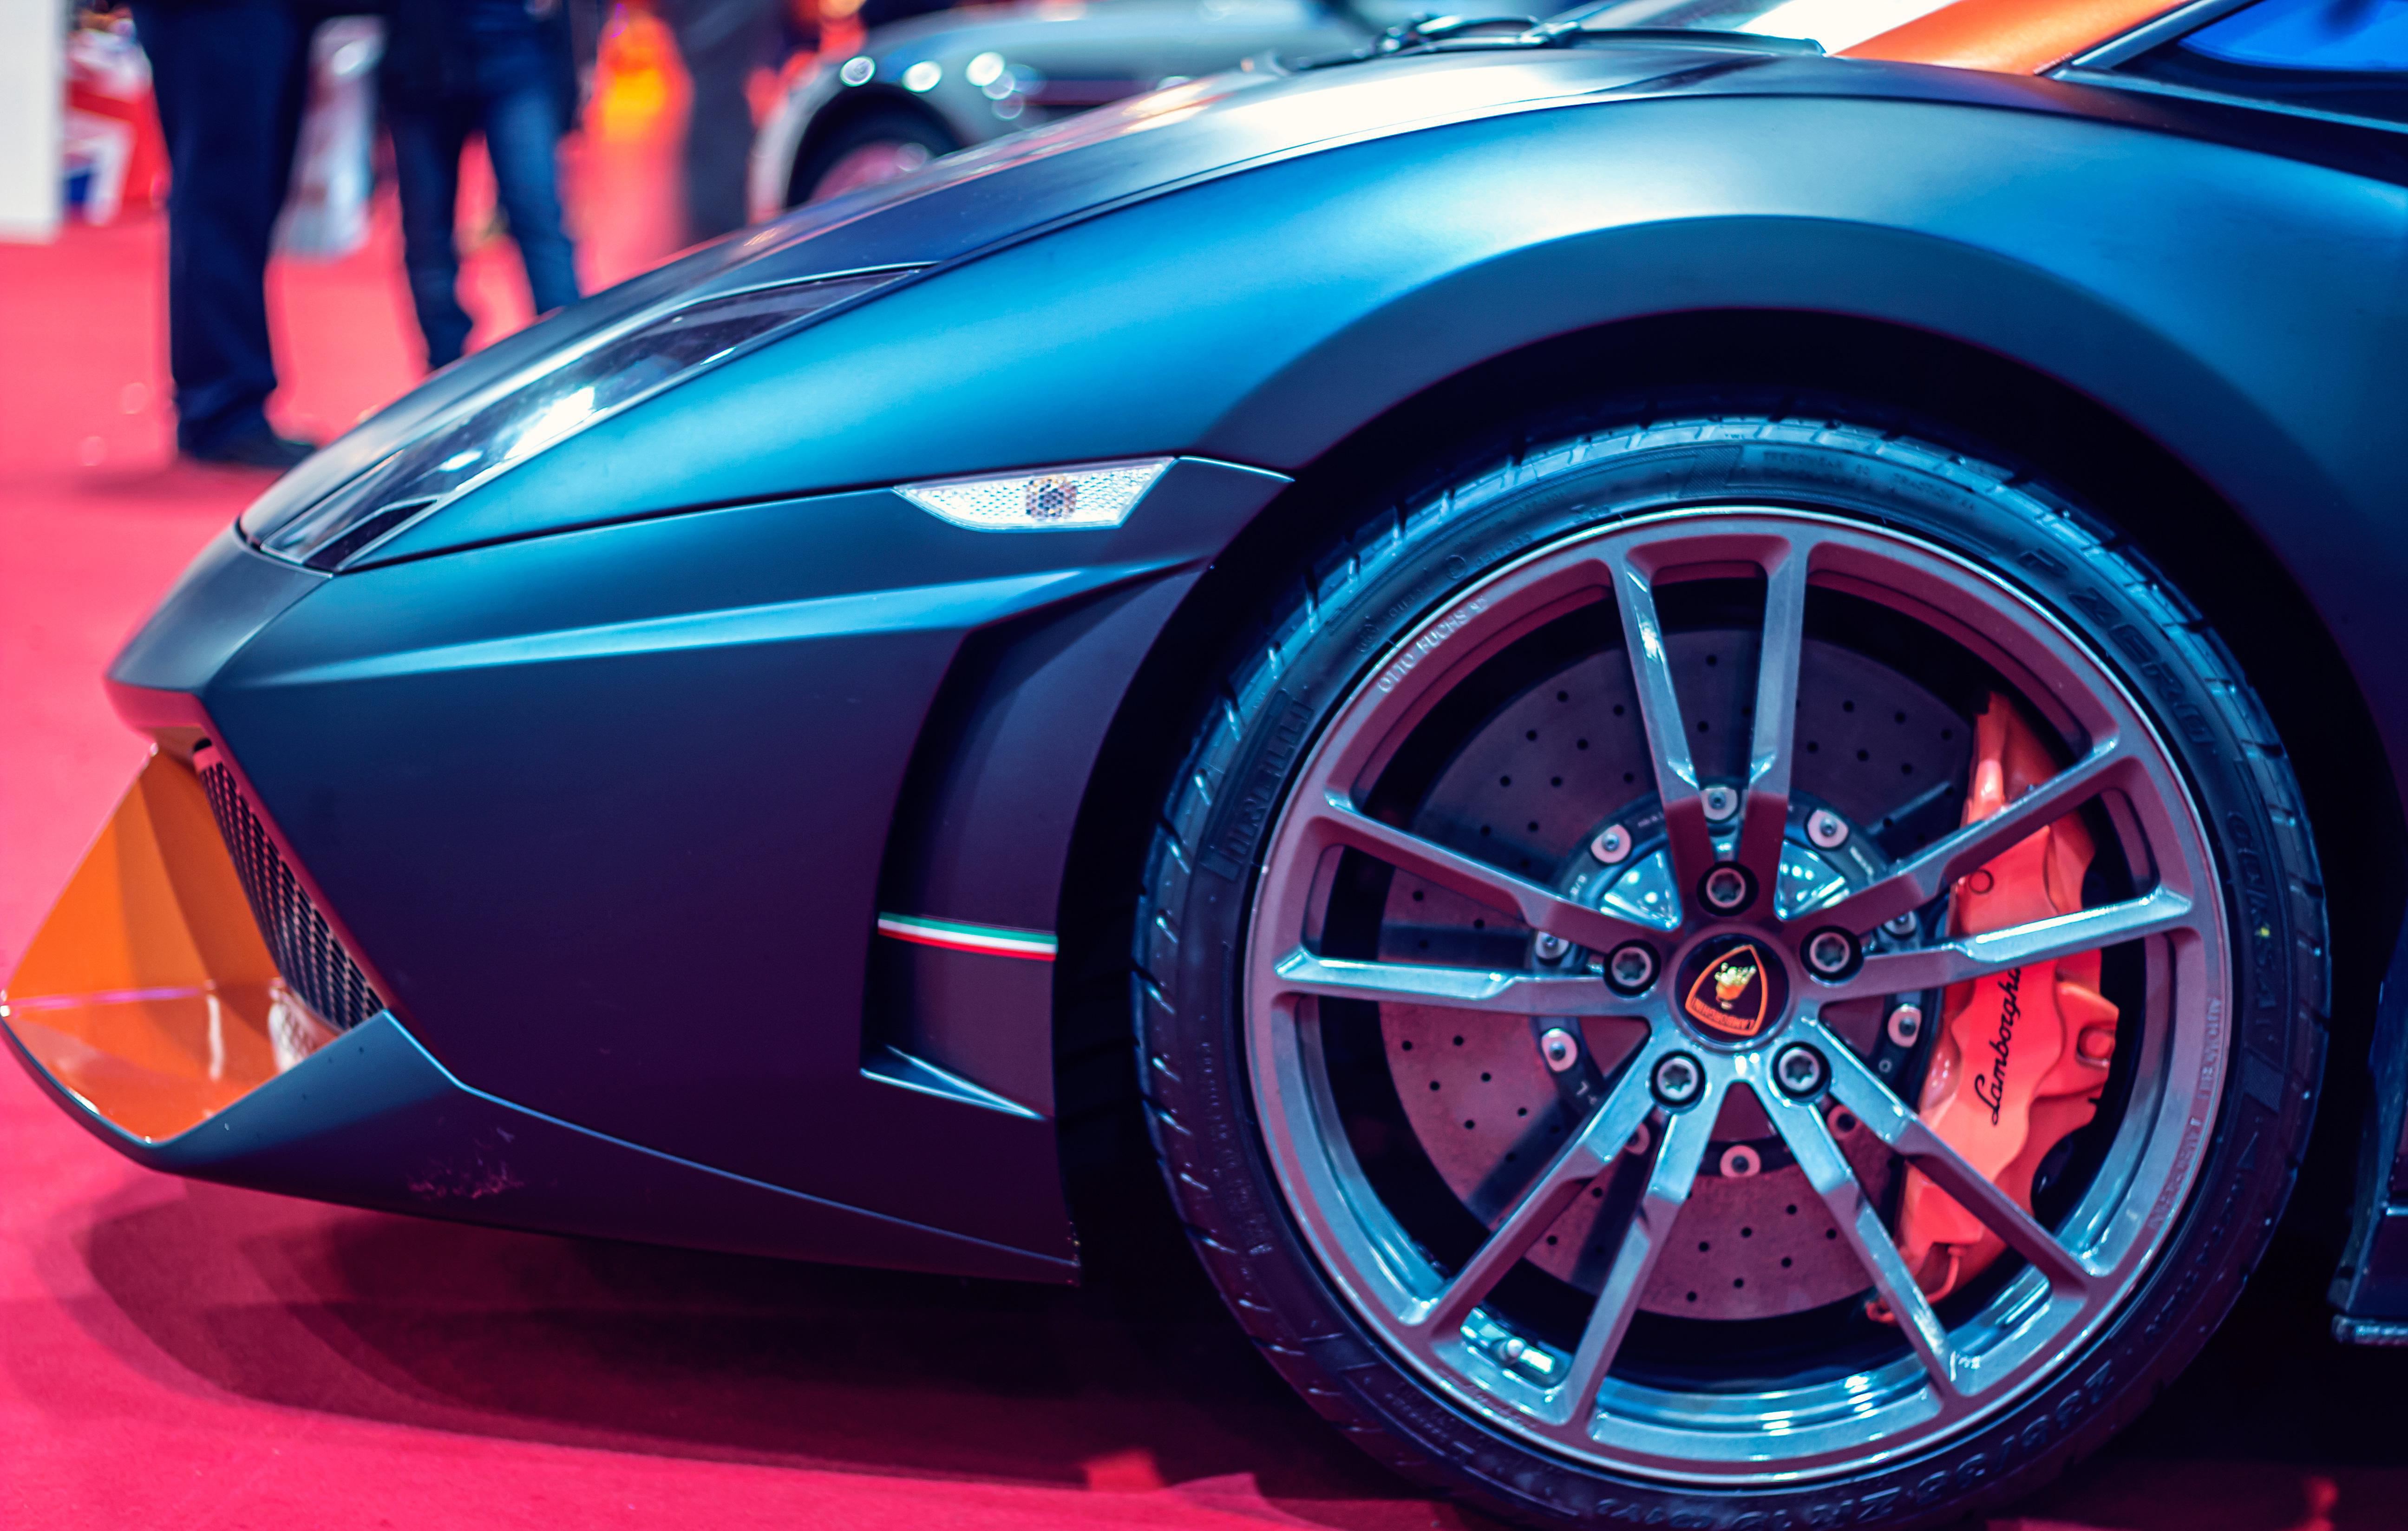 Free Images Wheel Sports Car Supercar Rim Auto Show Land